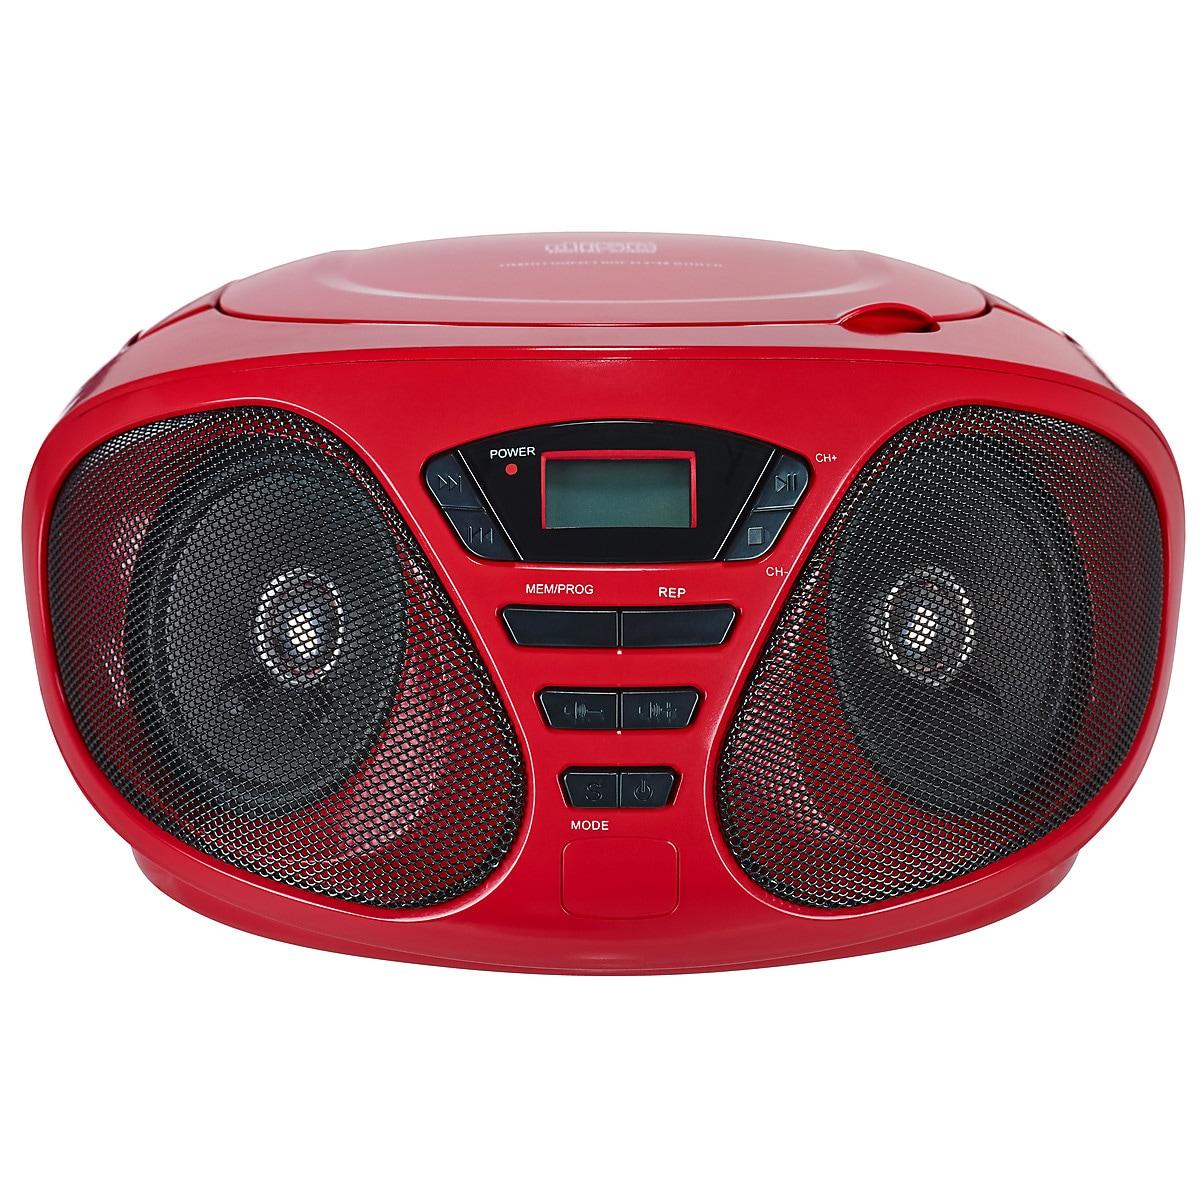 CD Player with FM Radio